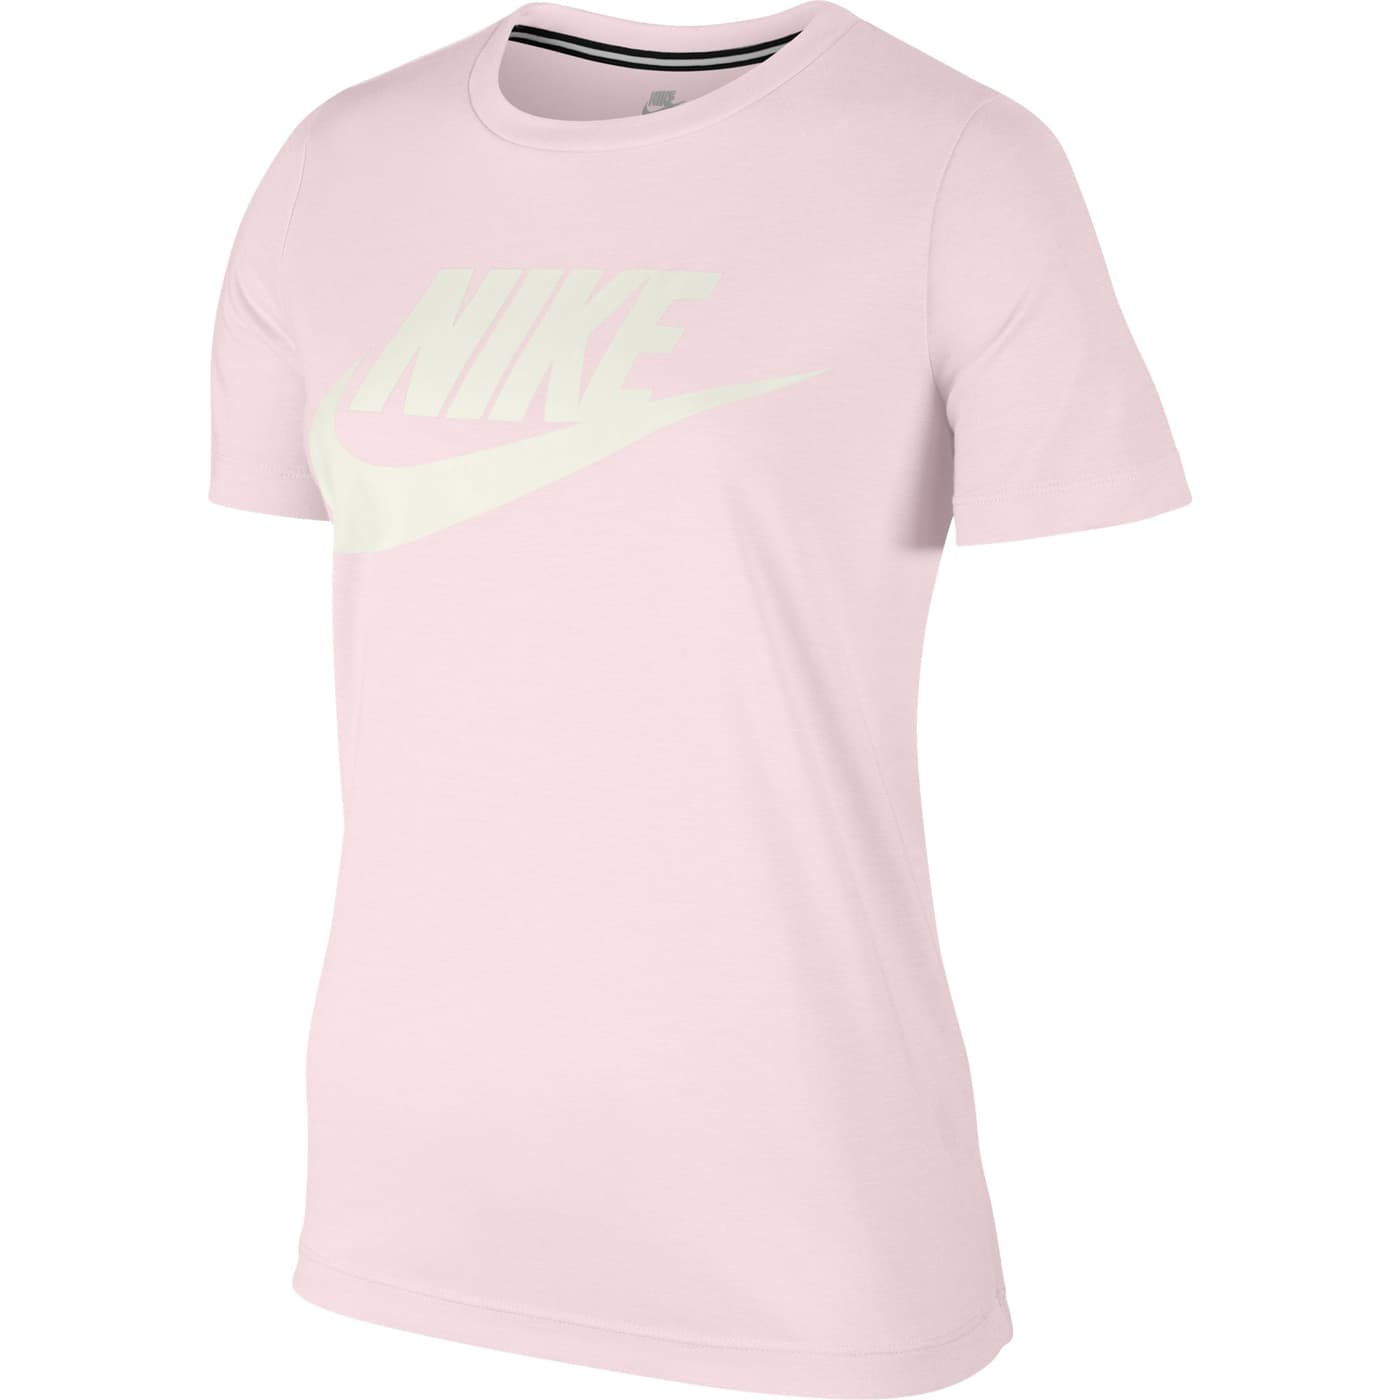 nike damen t shirt pink